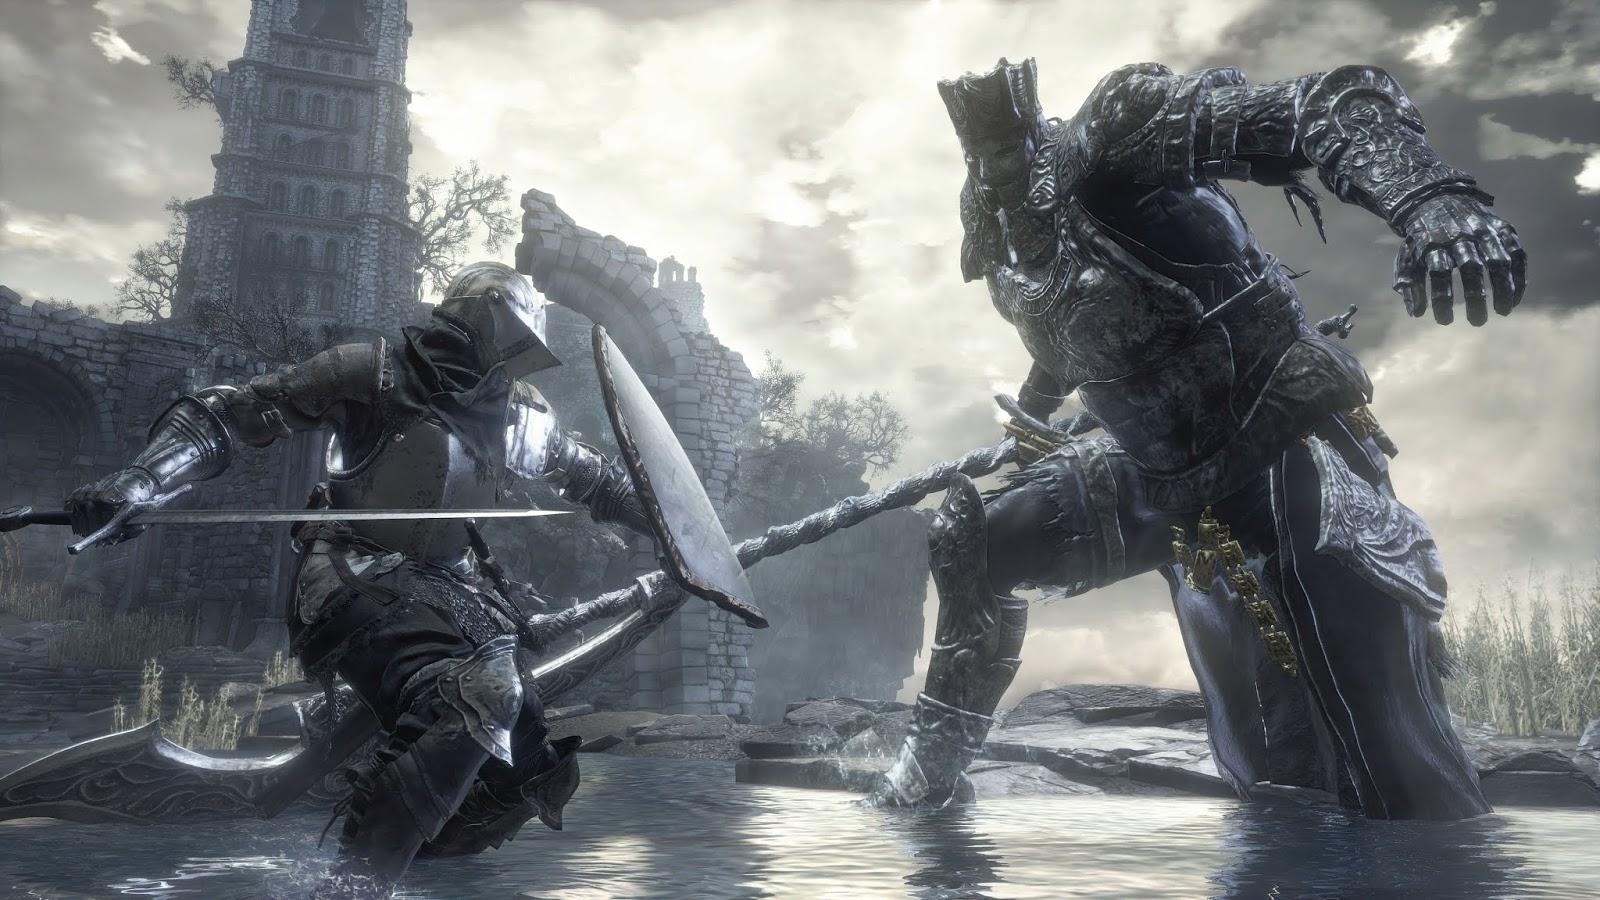 Dark Souls 3 Trainer Cheats And Mods Solidfilez Cheats